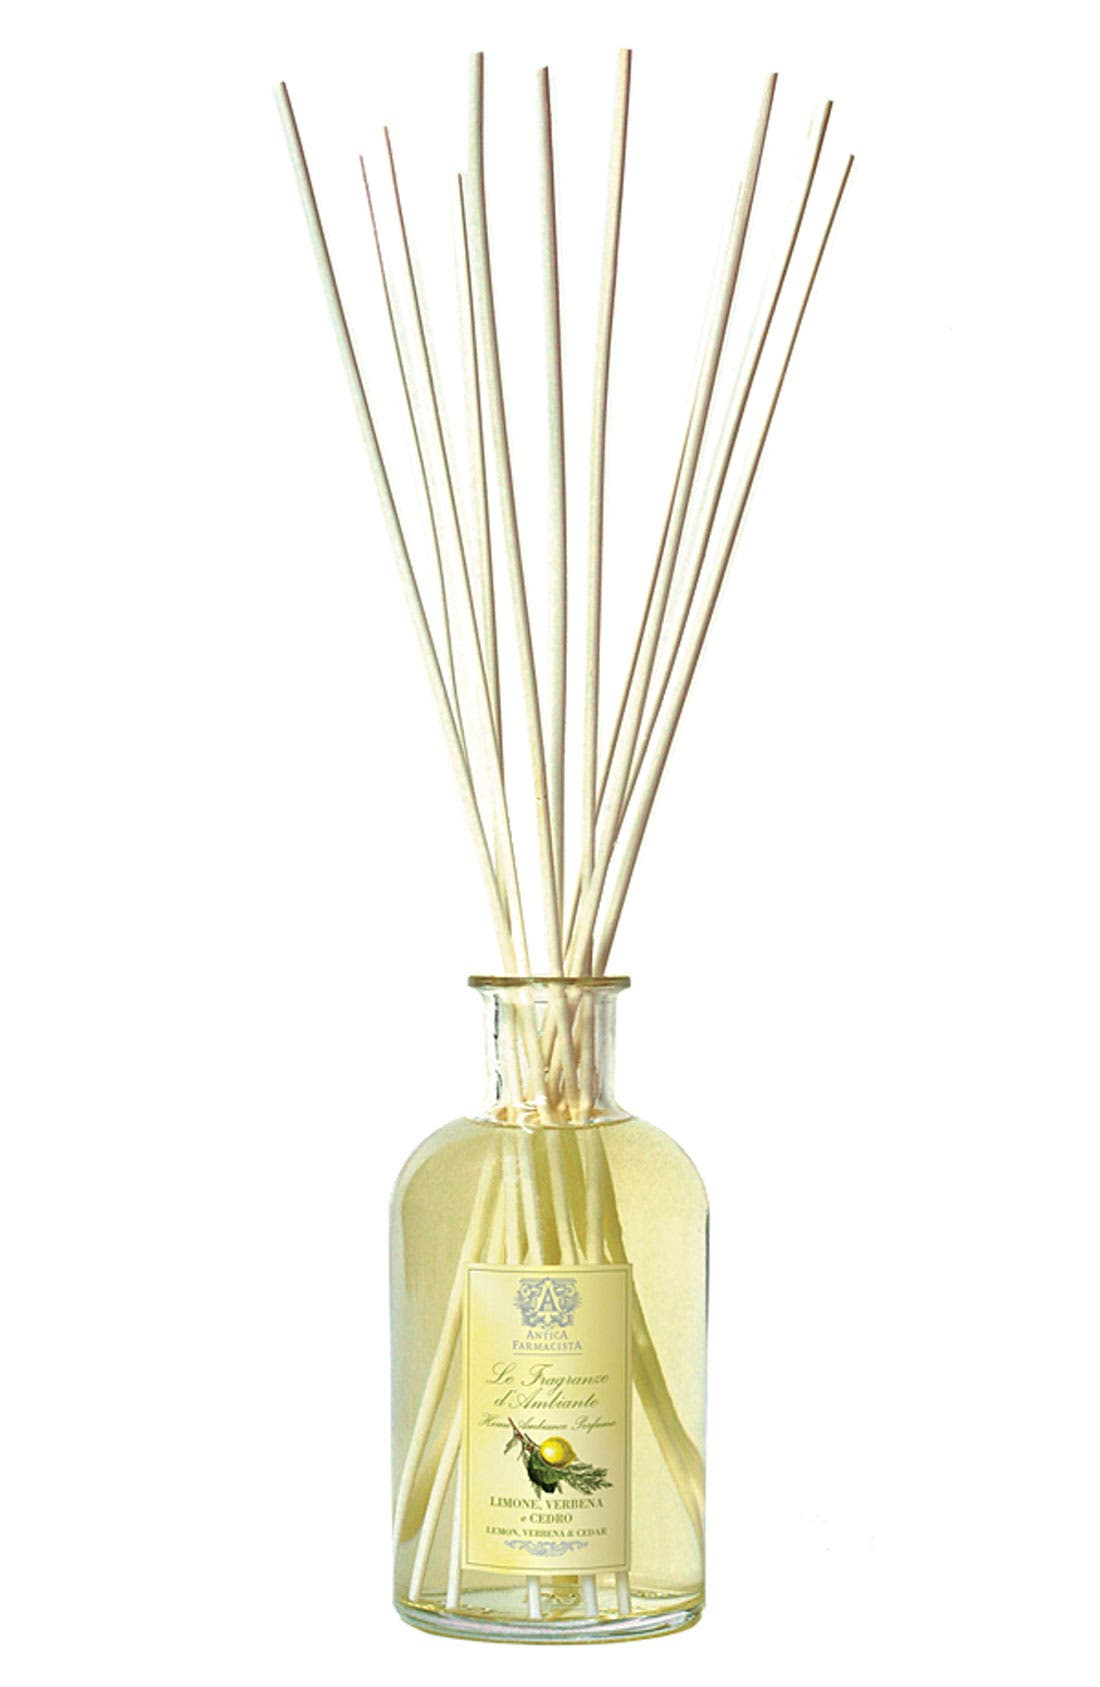 Alternate Image 1 Selected - Antica Farmacista 'Lemon, Verbena & Cedar' Home Ambiance Perfume